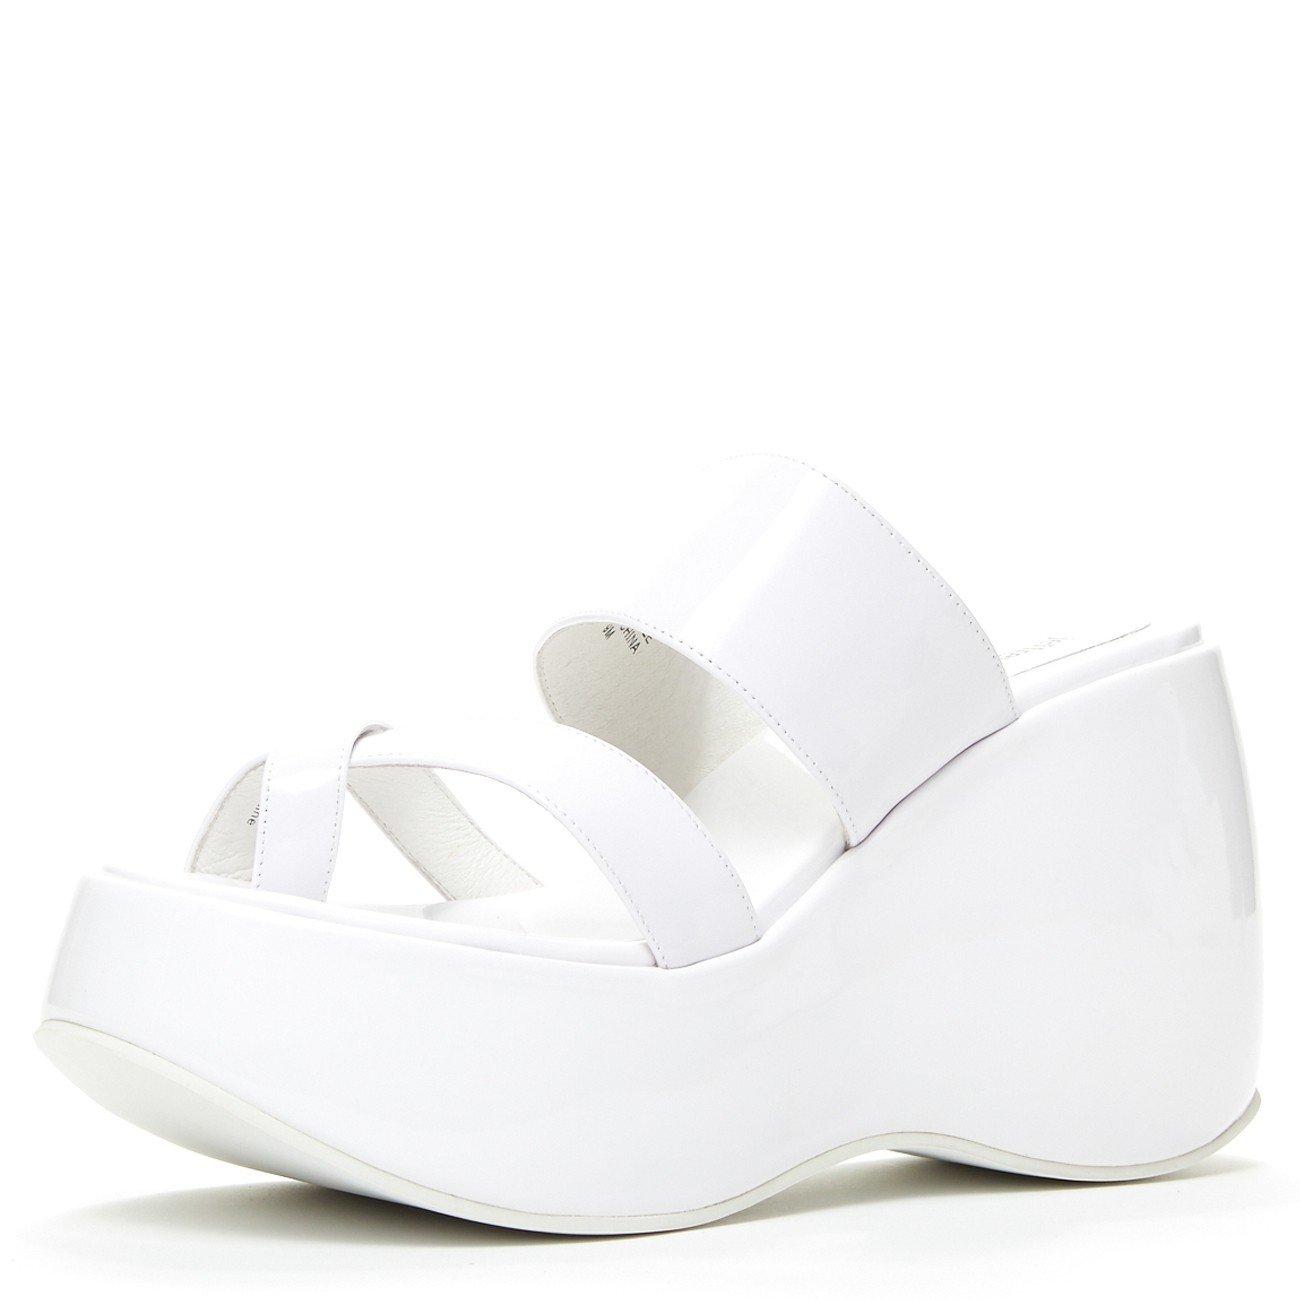 Jeffrey Campbell Vibe Leather Platform Toe Thong Sandal, White B07DR44937 8 B(M) US